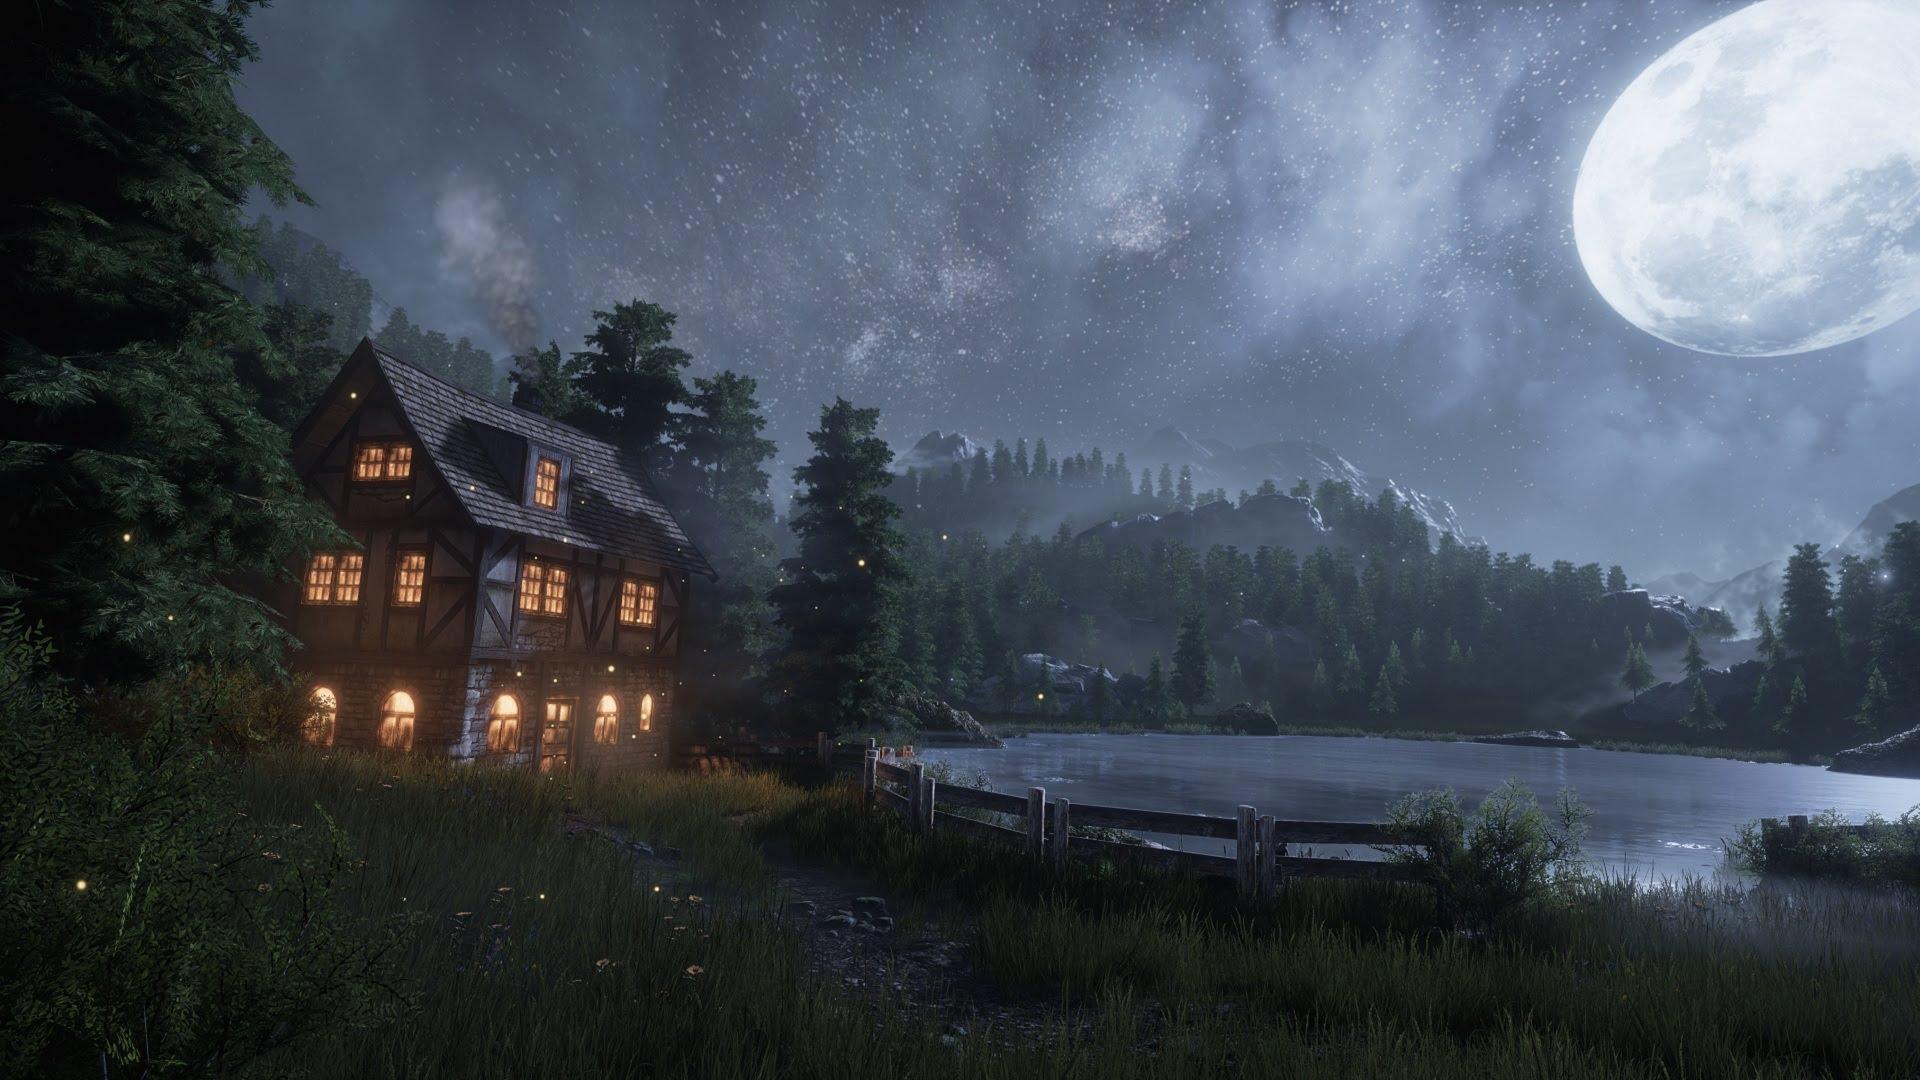 Creating a quick Unreal Engine 4 Night/Lake Scene - YouTube